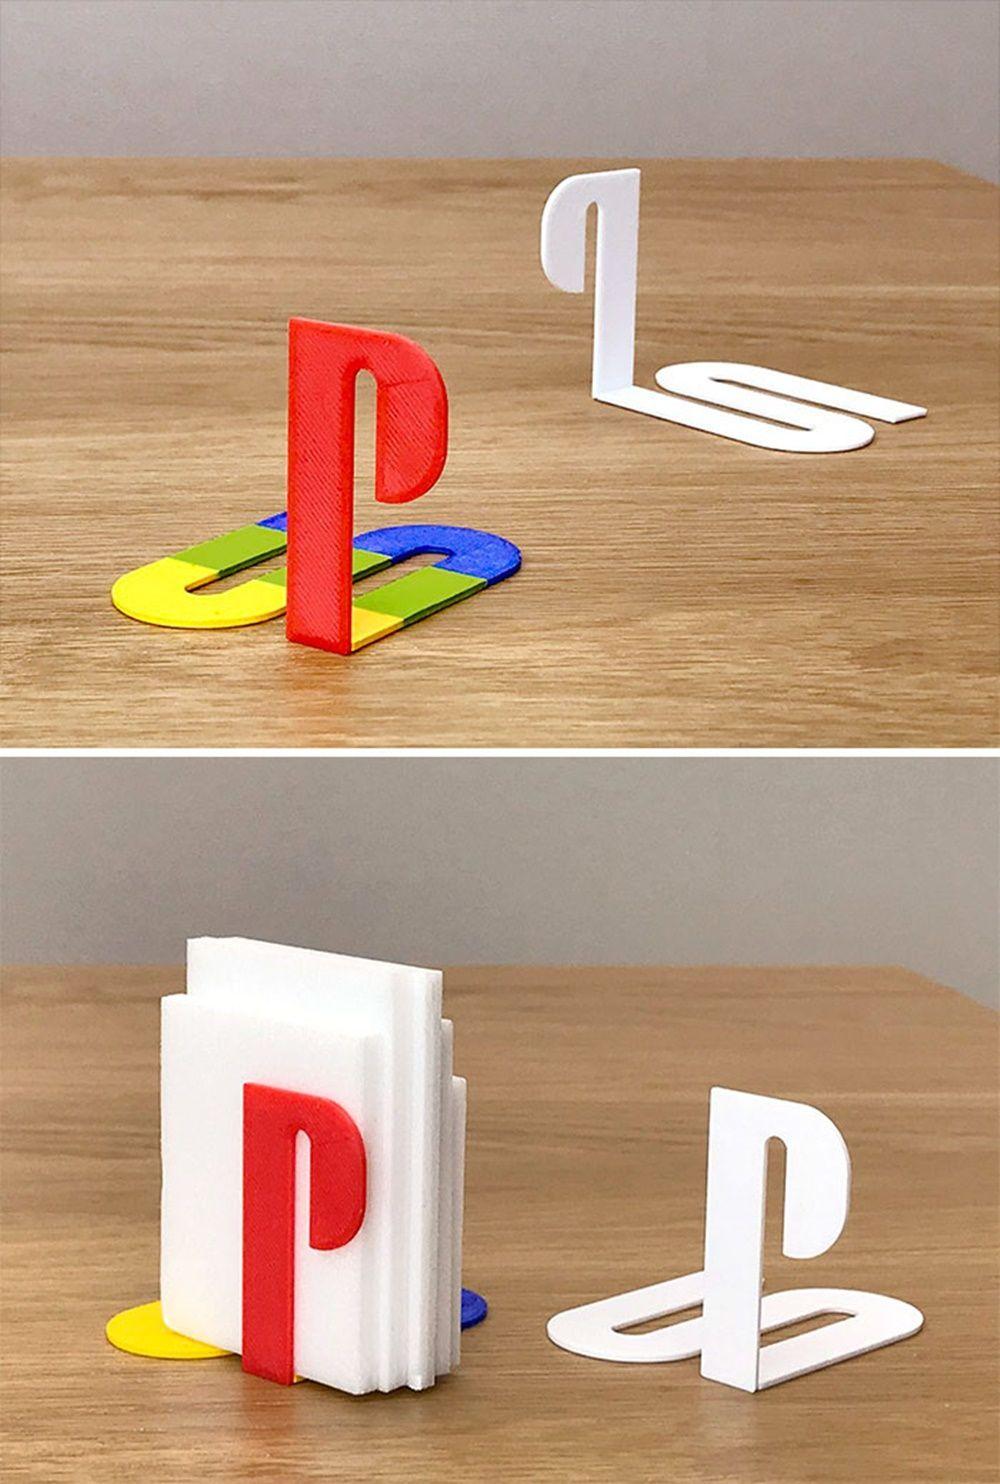 Logo 10 Play Station  Berfungsi Book Holder Lucu Ya Unik Benda Terinspirasi Brand Terkenal